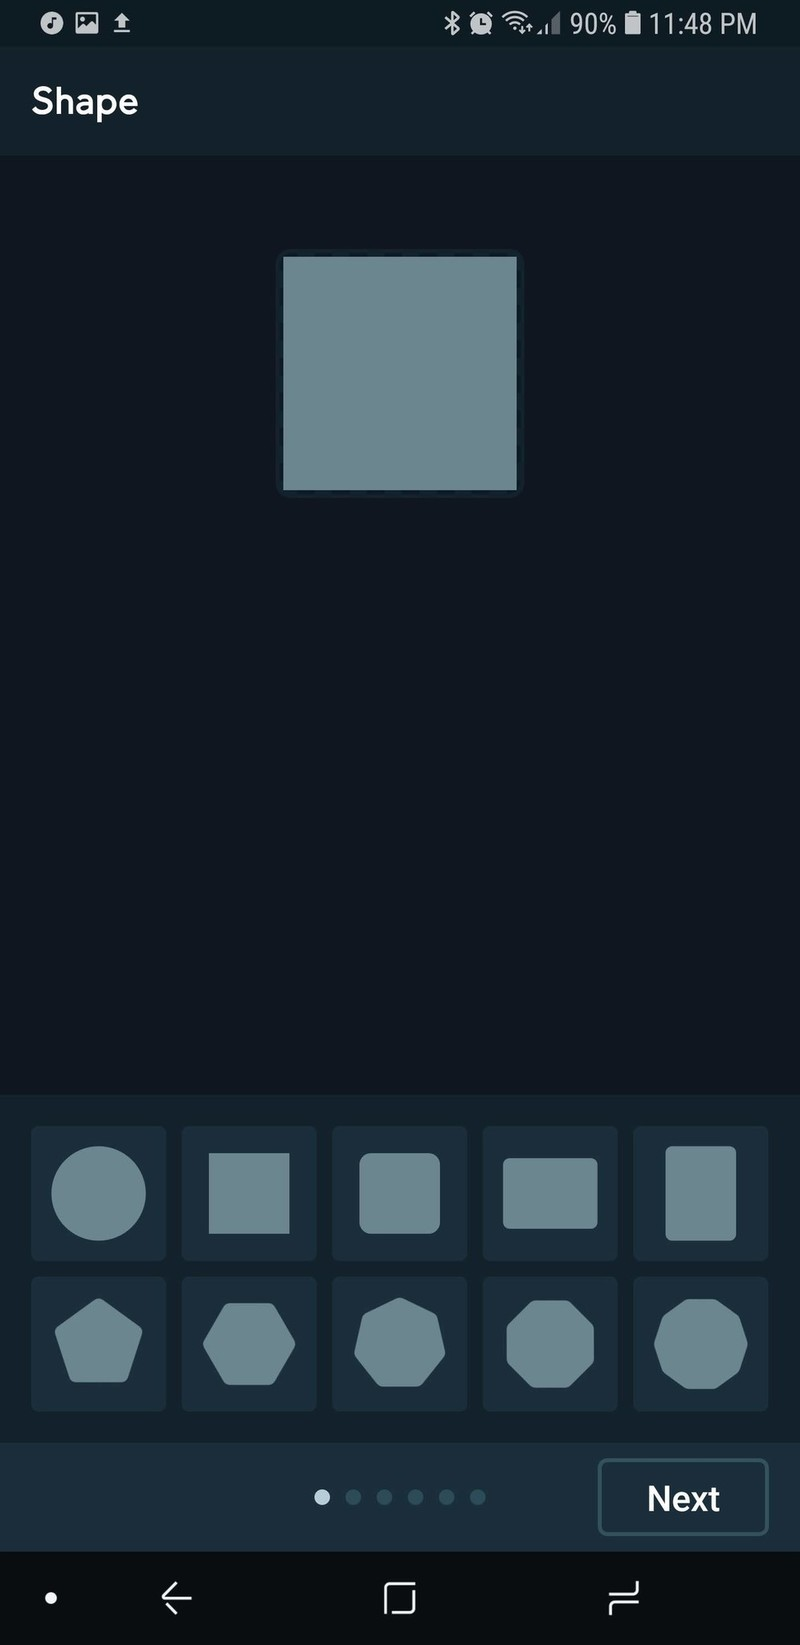 deadpool-18-icons-import-3.jpg?itok=7uot